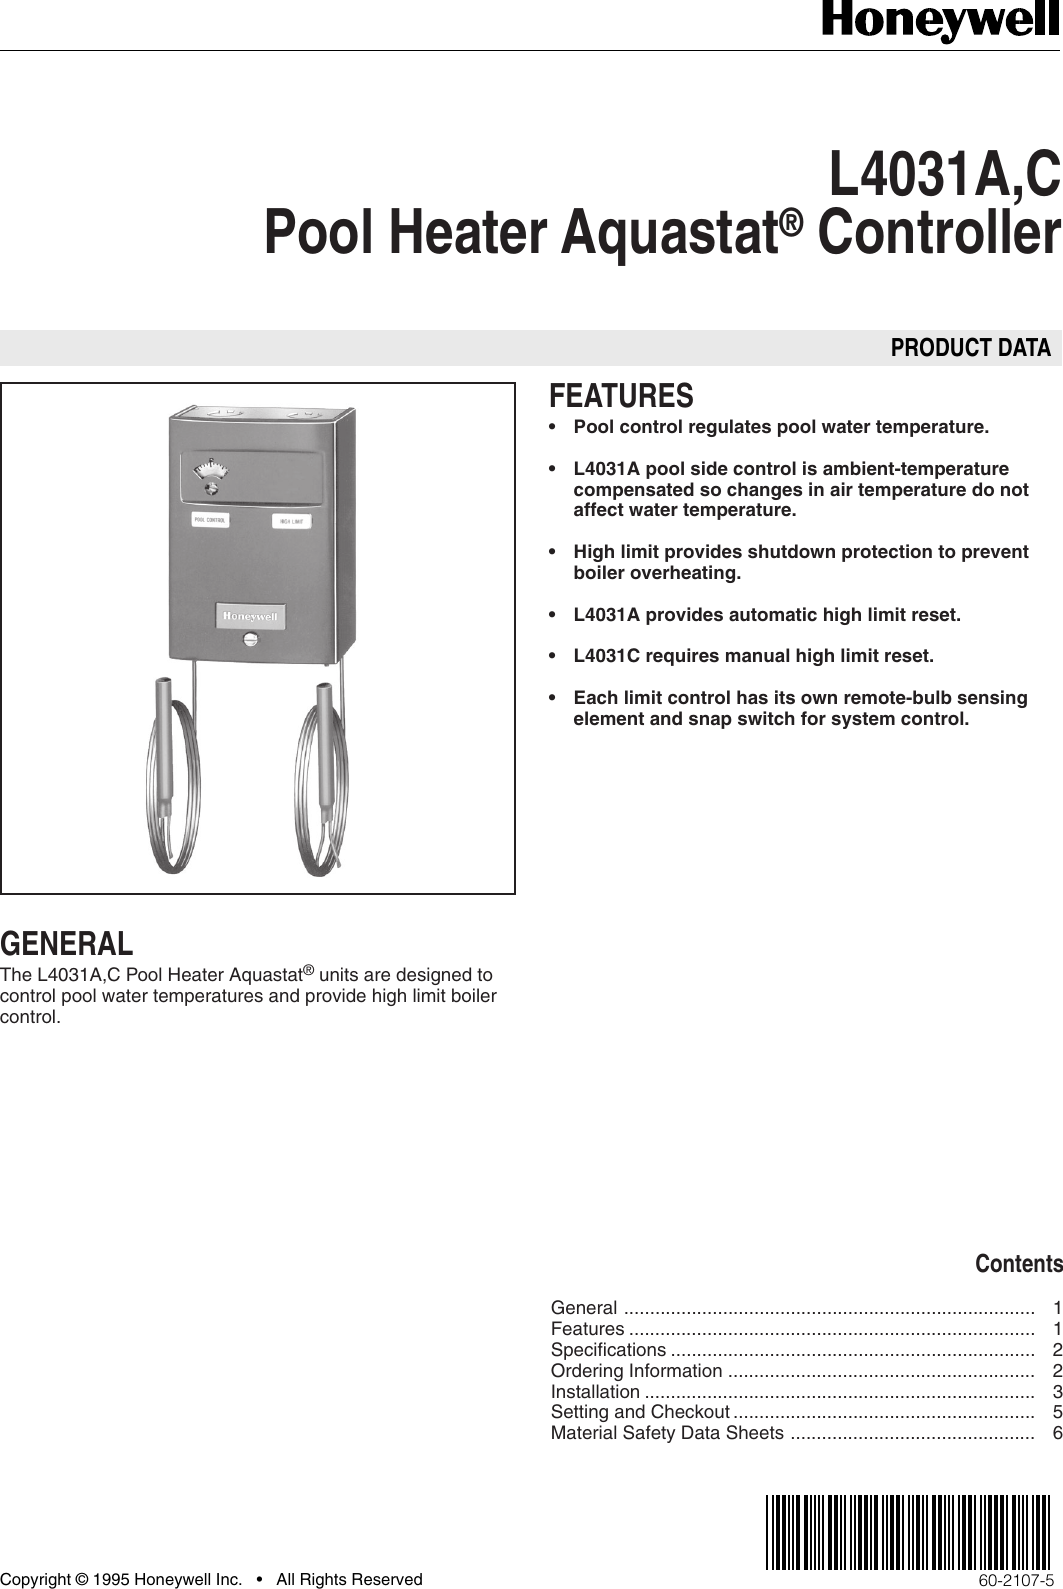 page 1 of 12 - honeywell honeywell-c-users-manual- 60-